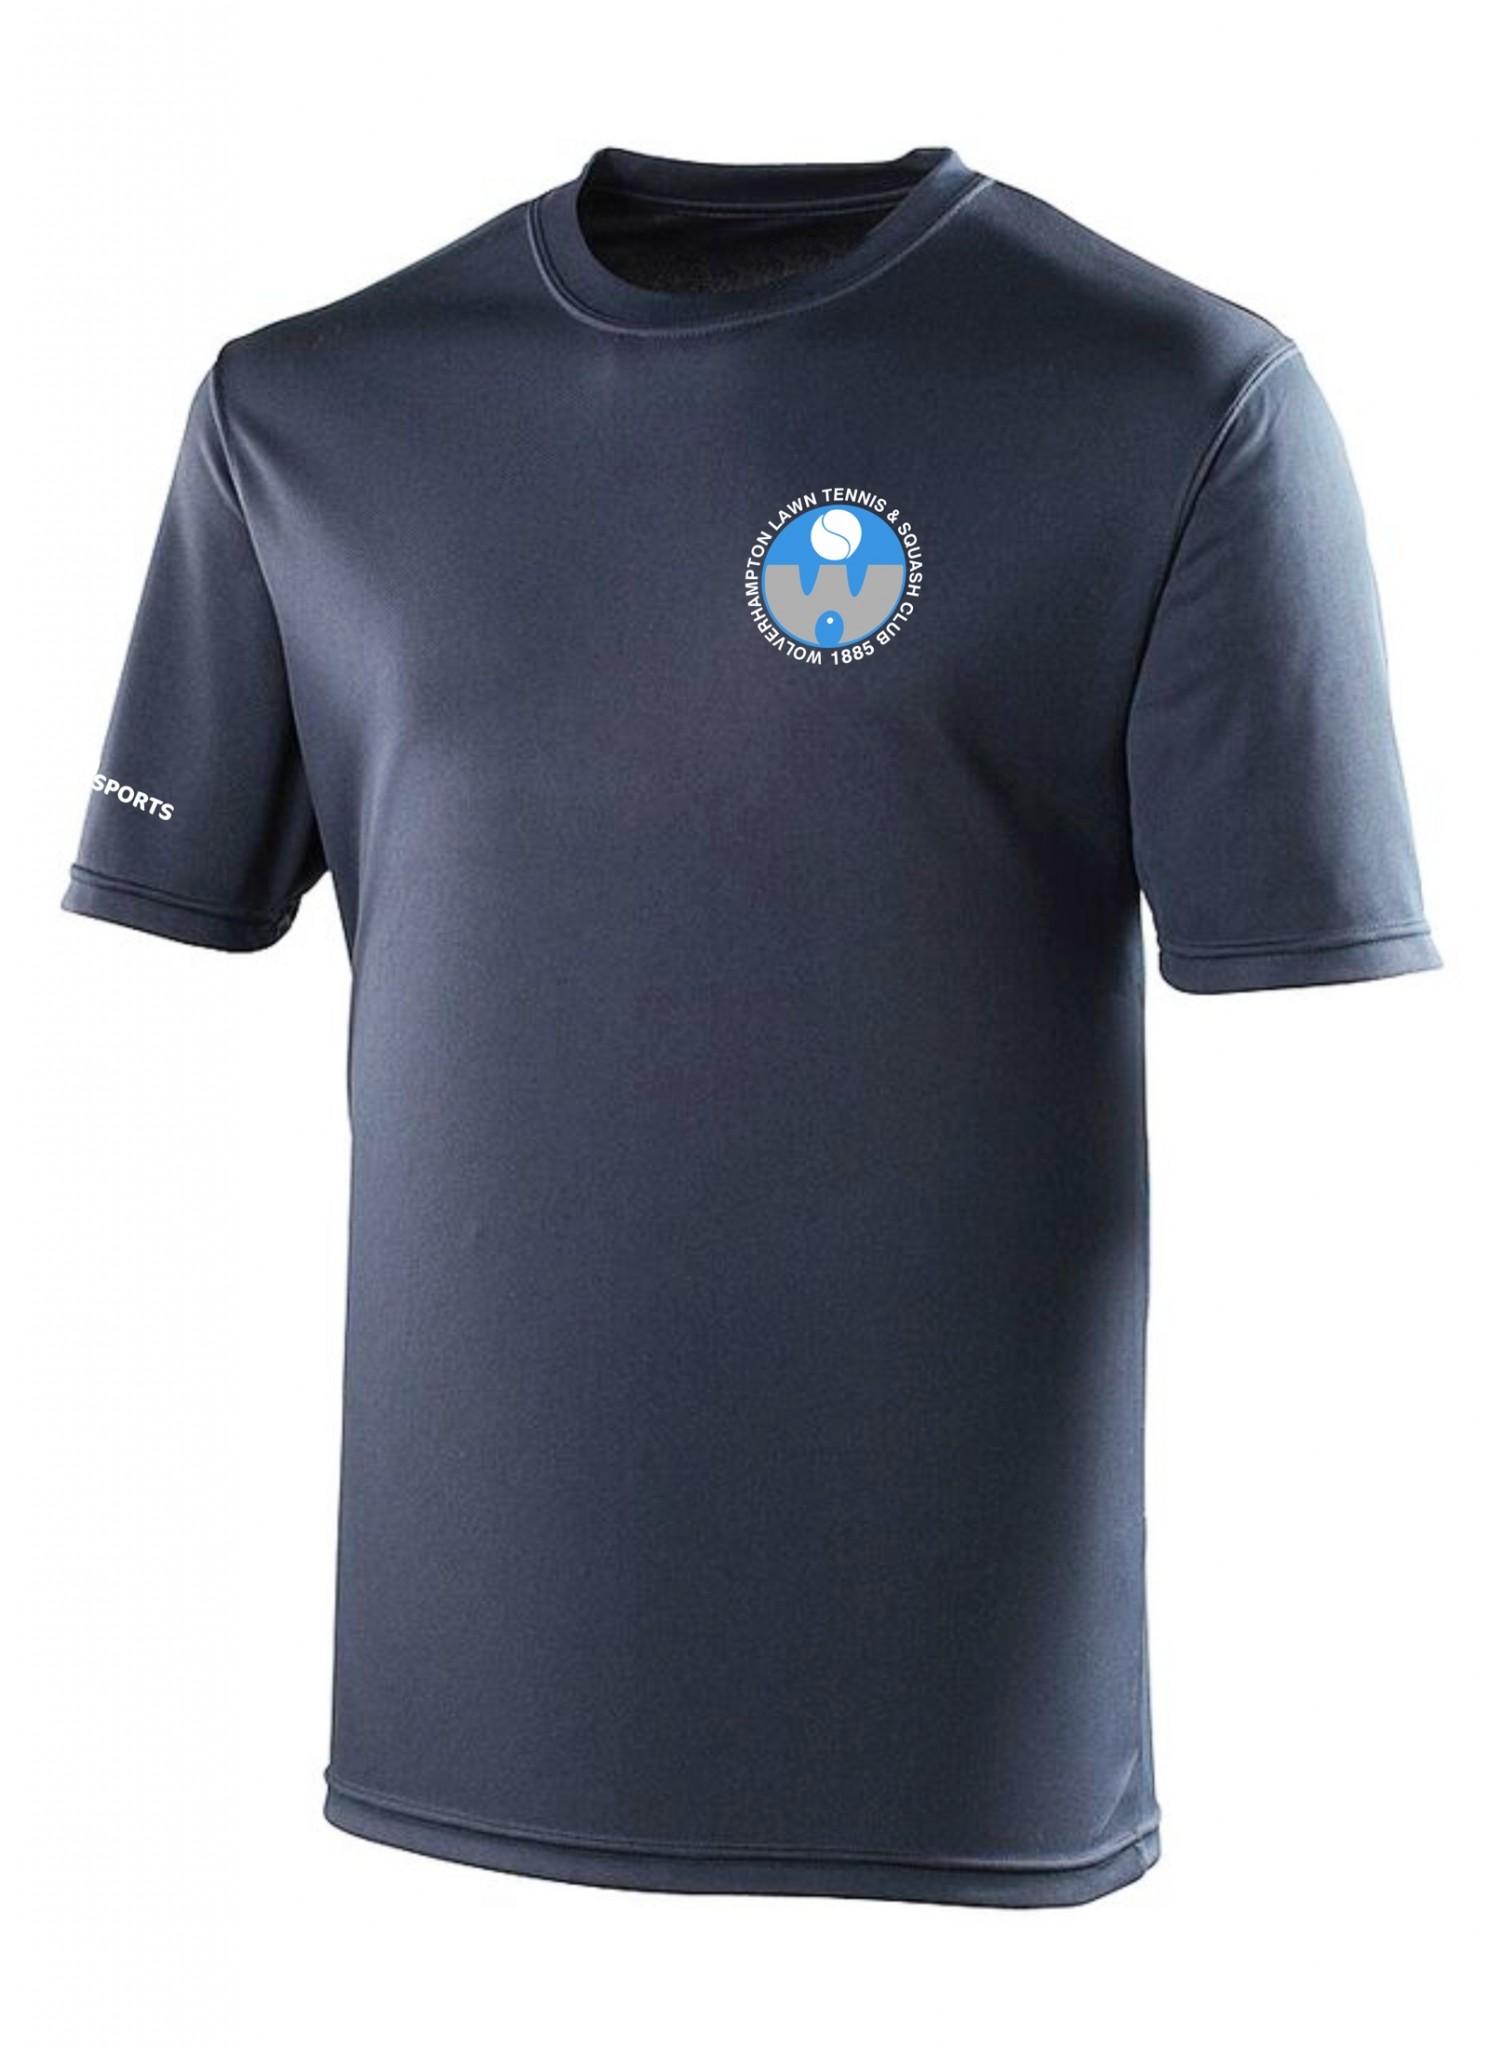 Wltsc mens classic sports t shirt iprosports for Mens sport t shirts